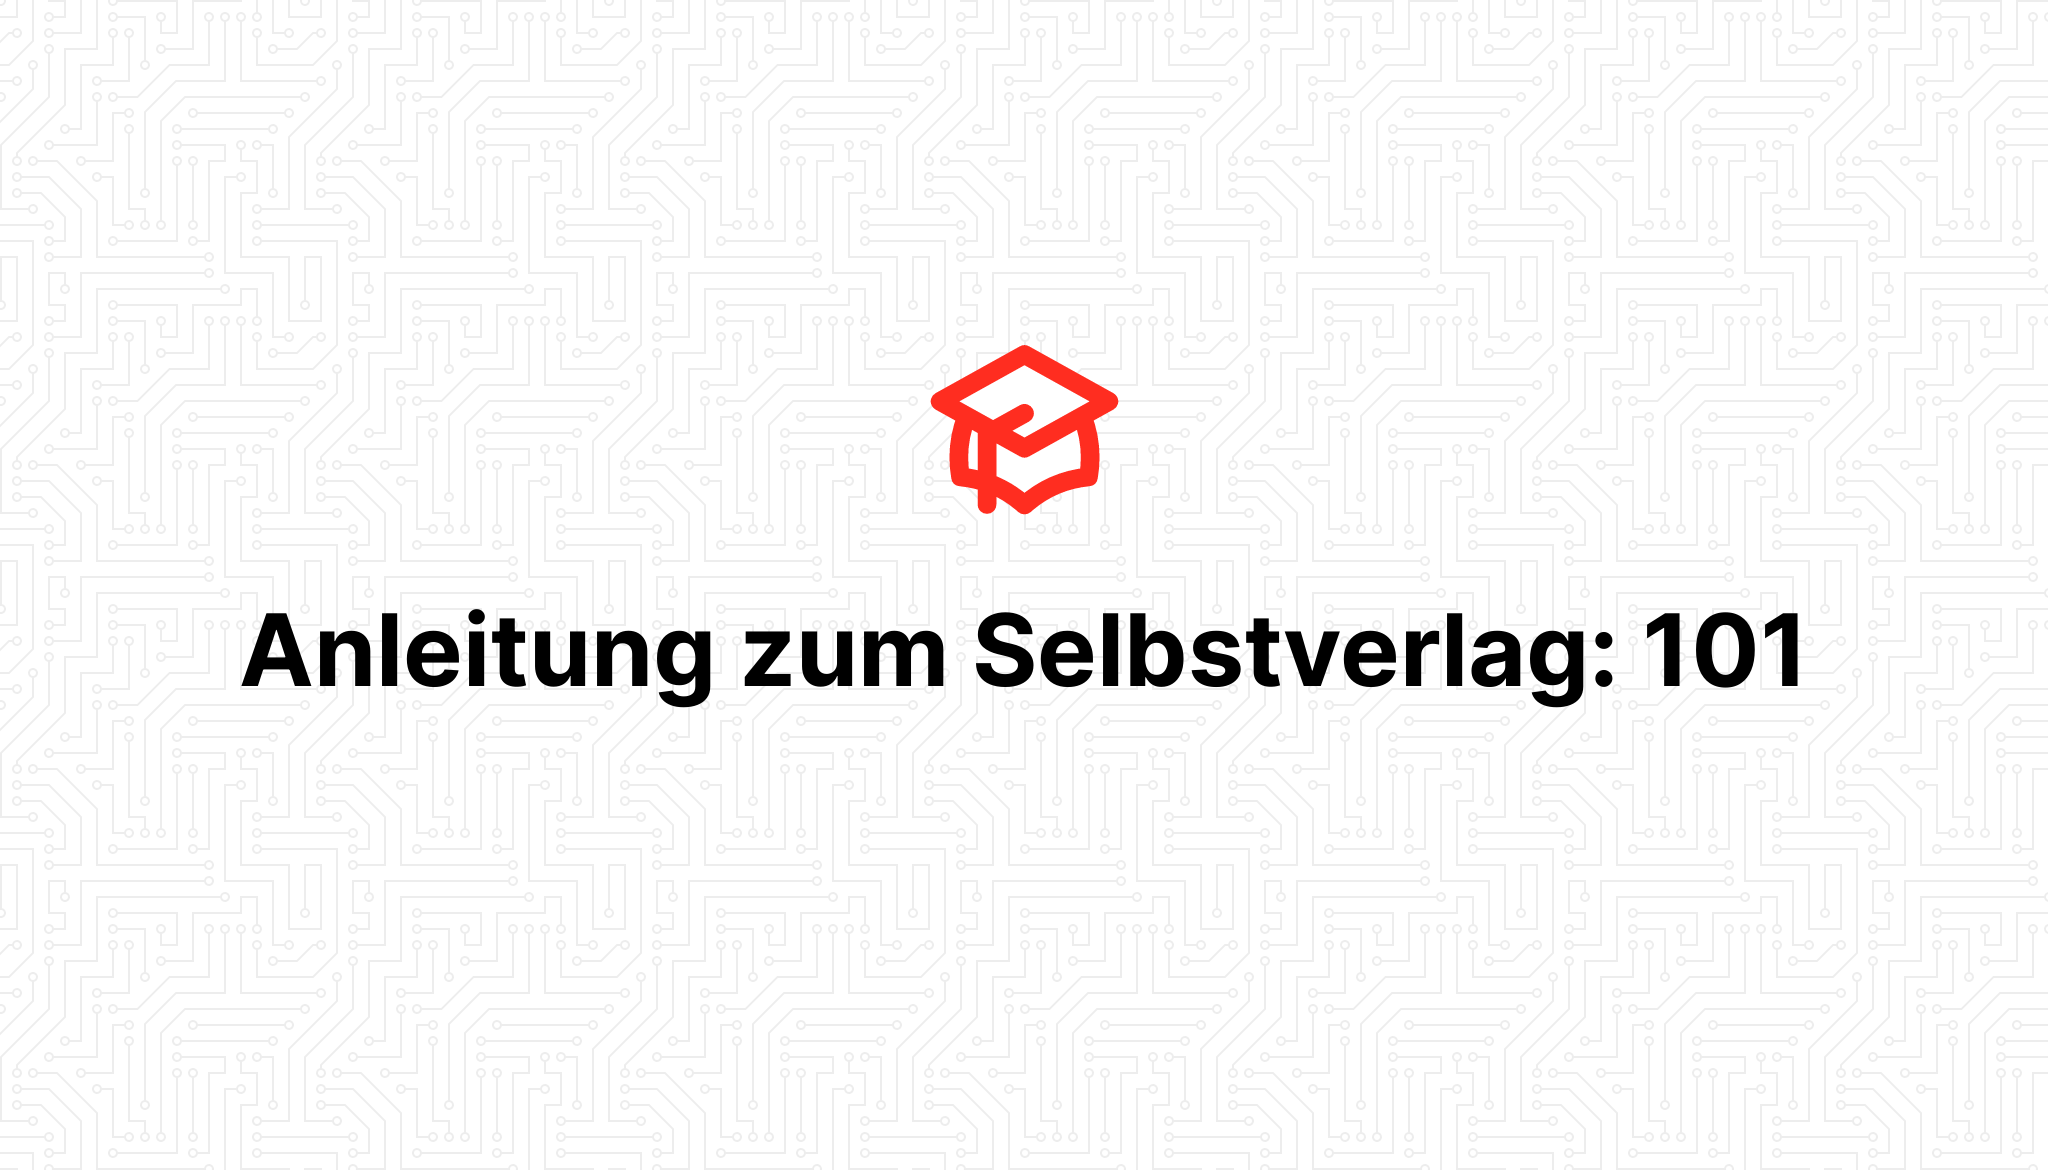 Anleitung zum Selbstverlag: 101